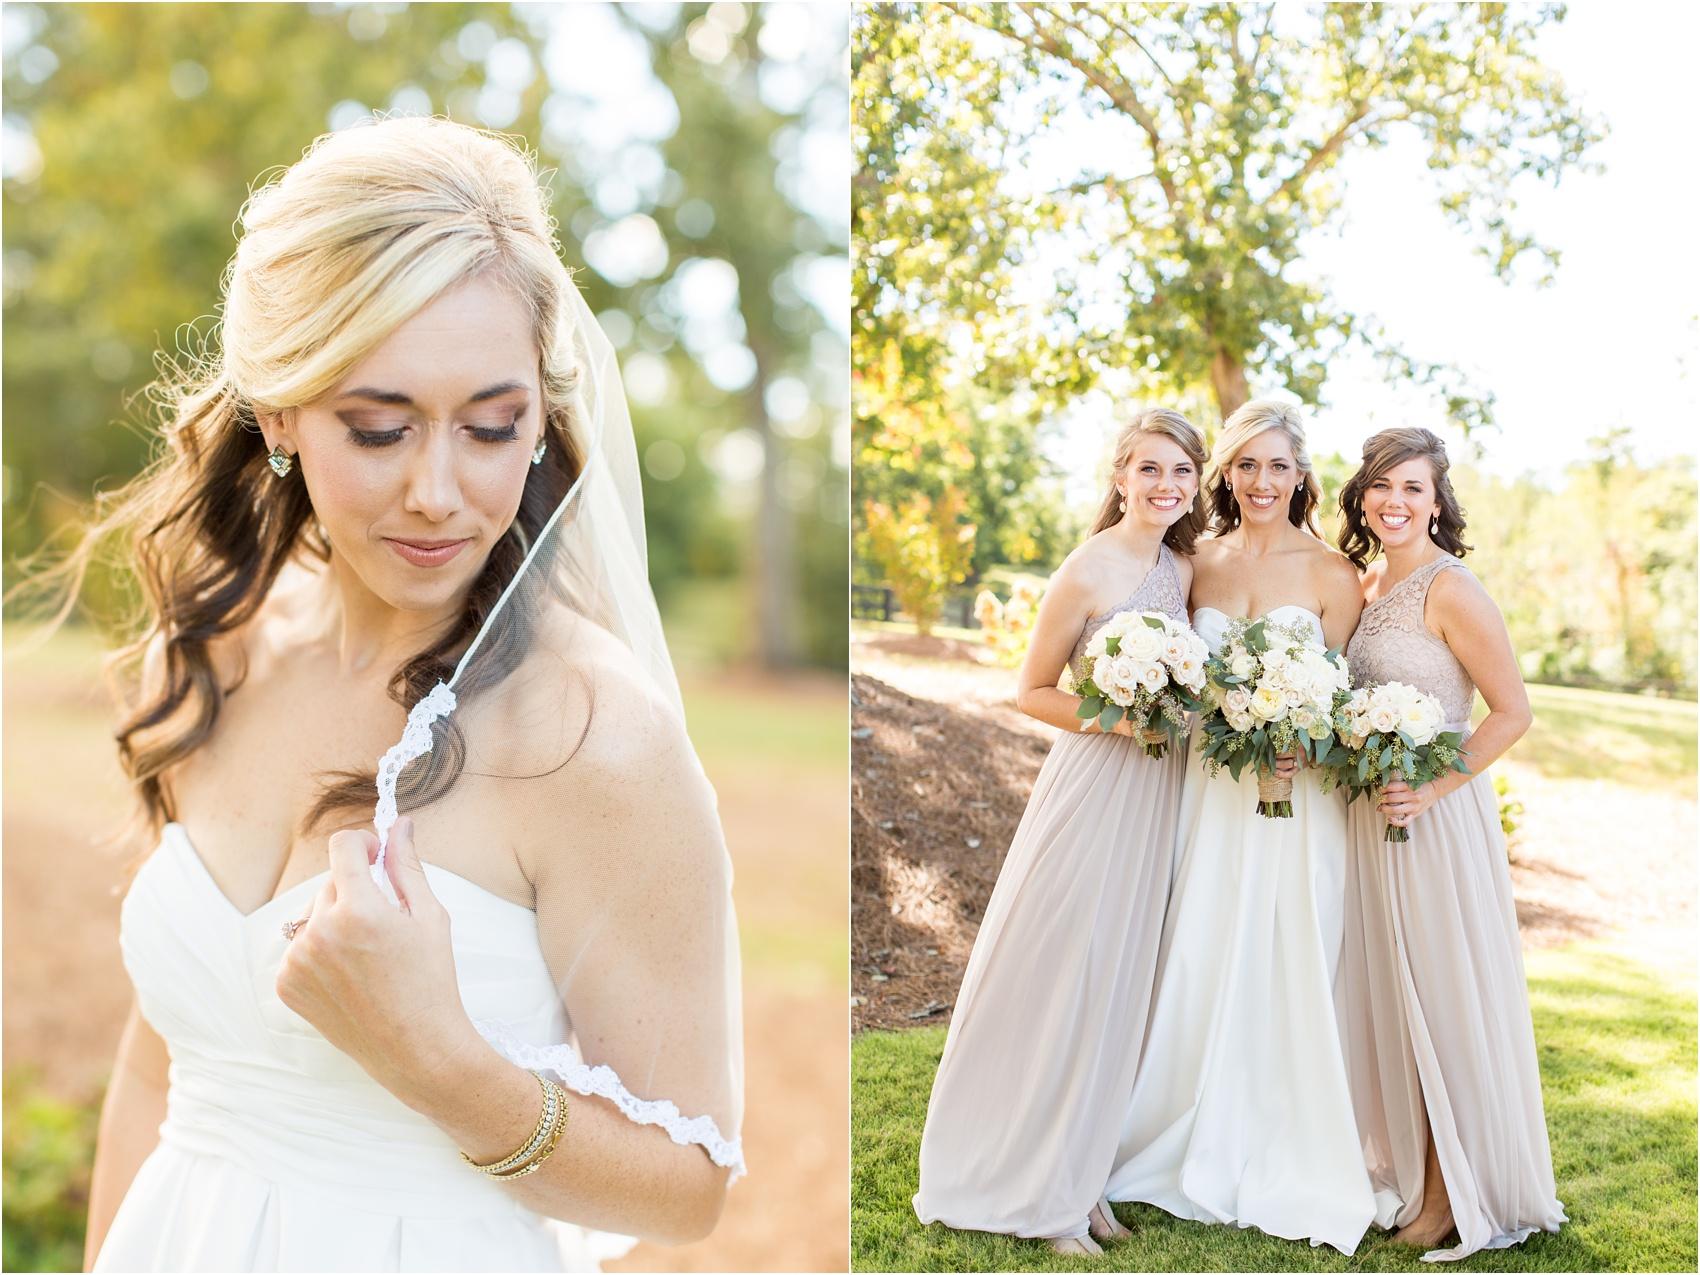 Savannah Eve Photography- Spencer Wedding- Blog-3.jpg